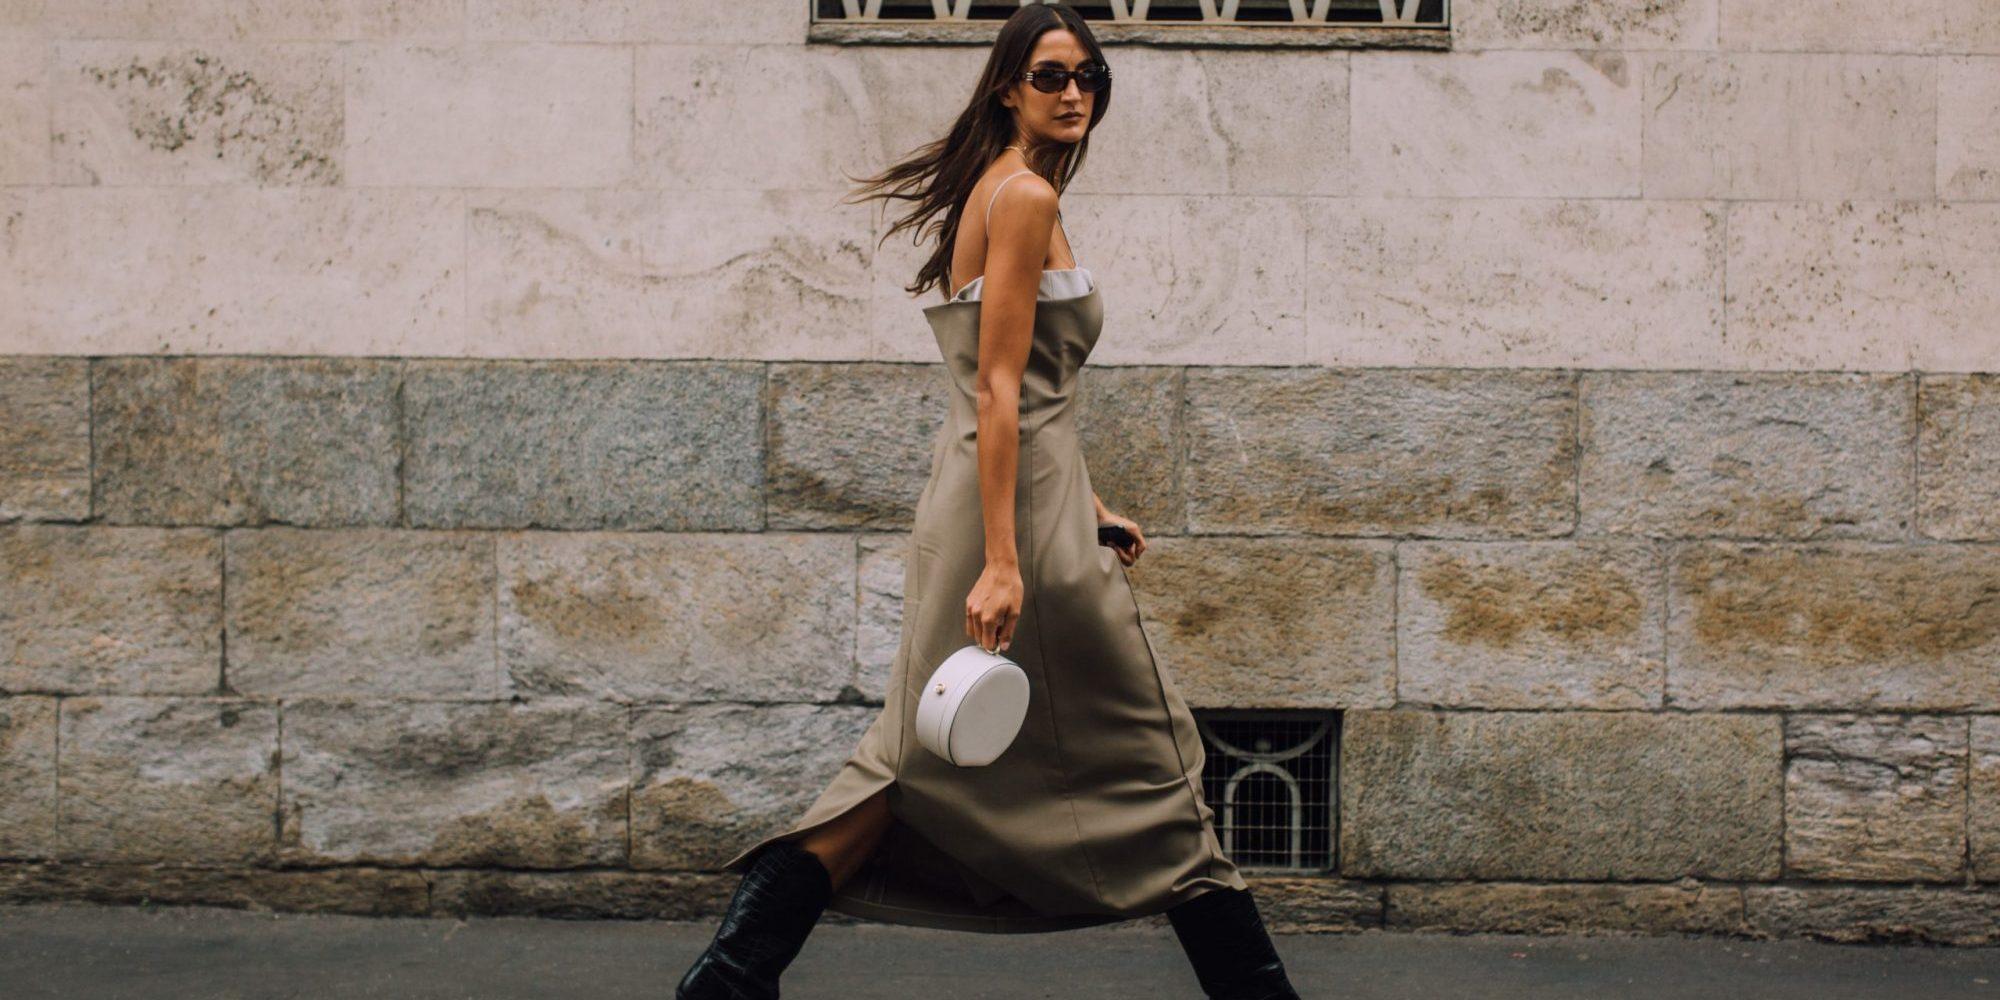 Street Style: Τι φορούν τώρα οι πιο καλοντυμένες γυναίκες στο Μιλάνο;